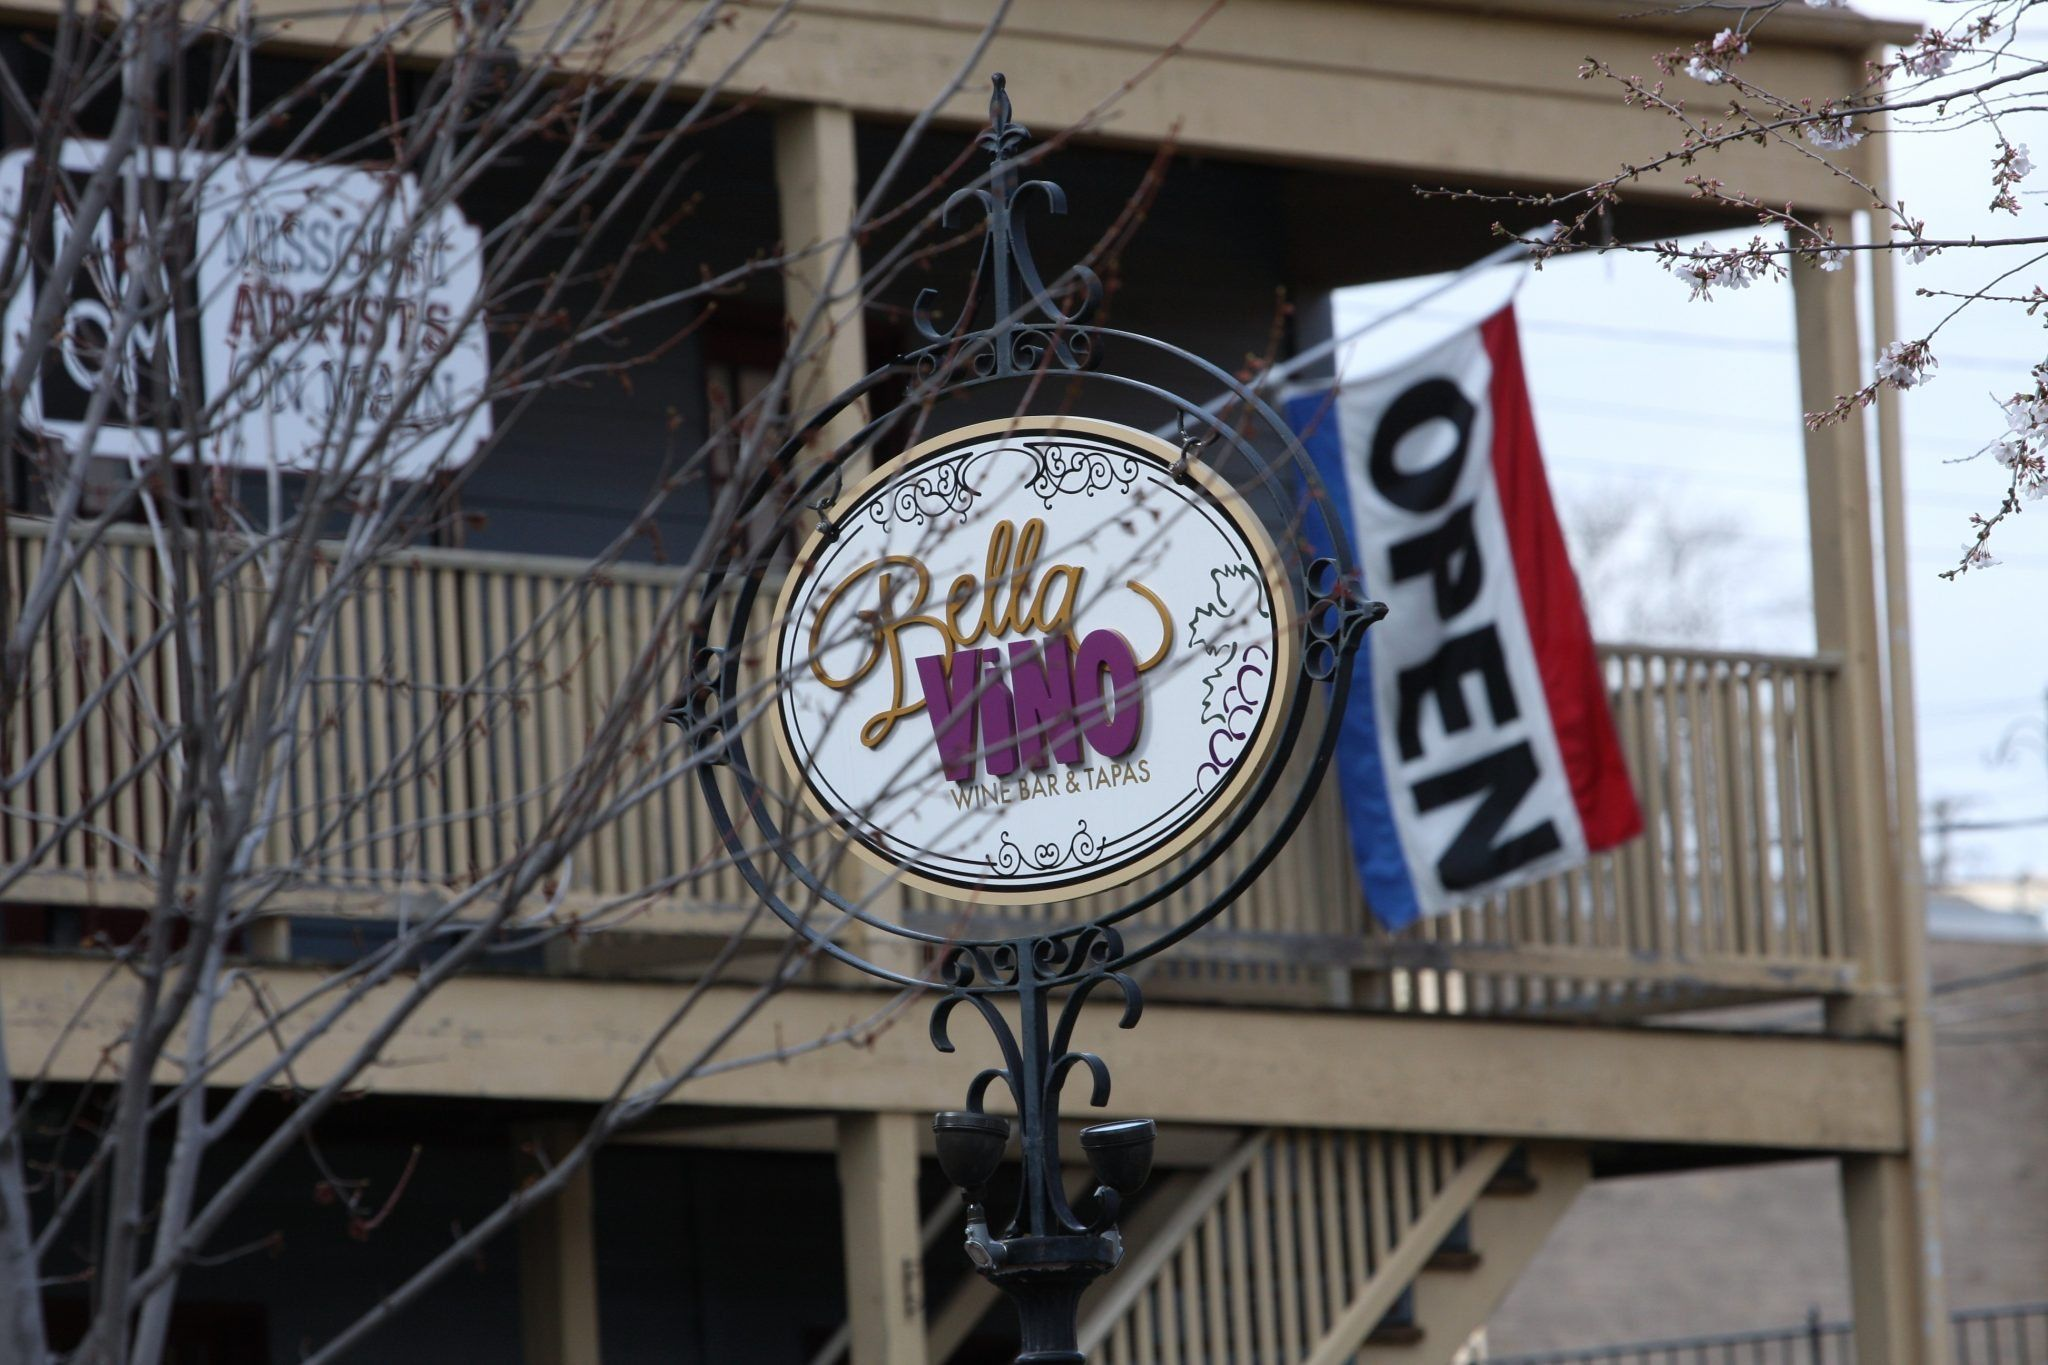 St. Louisu0027 10 Best Wine Bars ST. LOUIS, MO/March 25